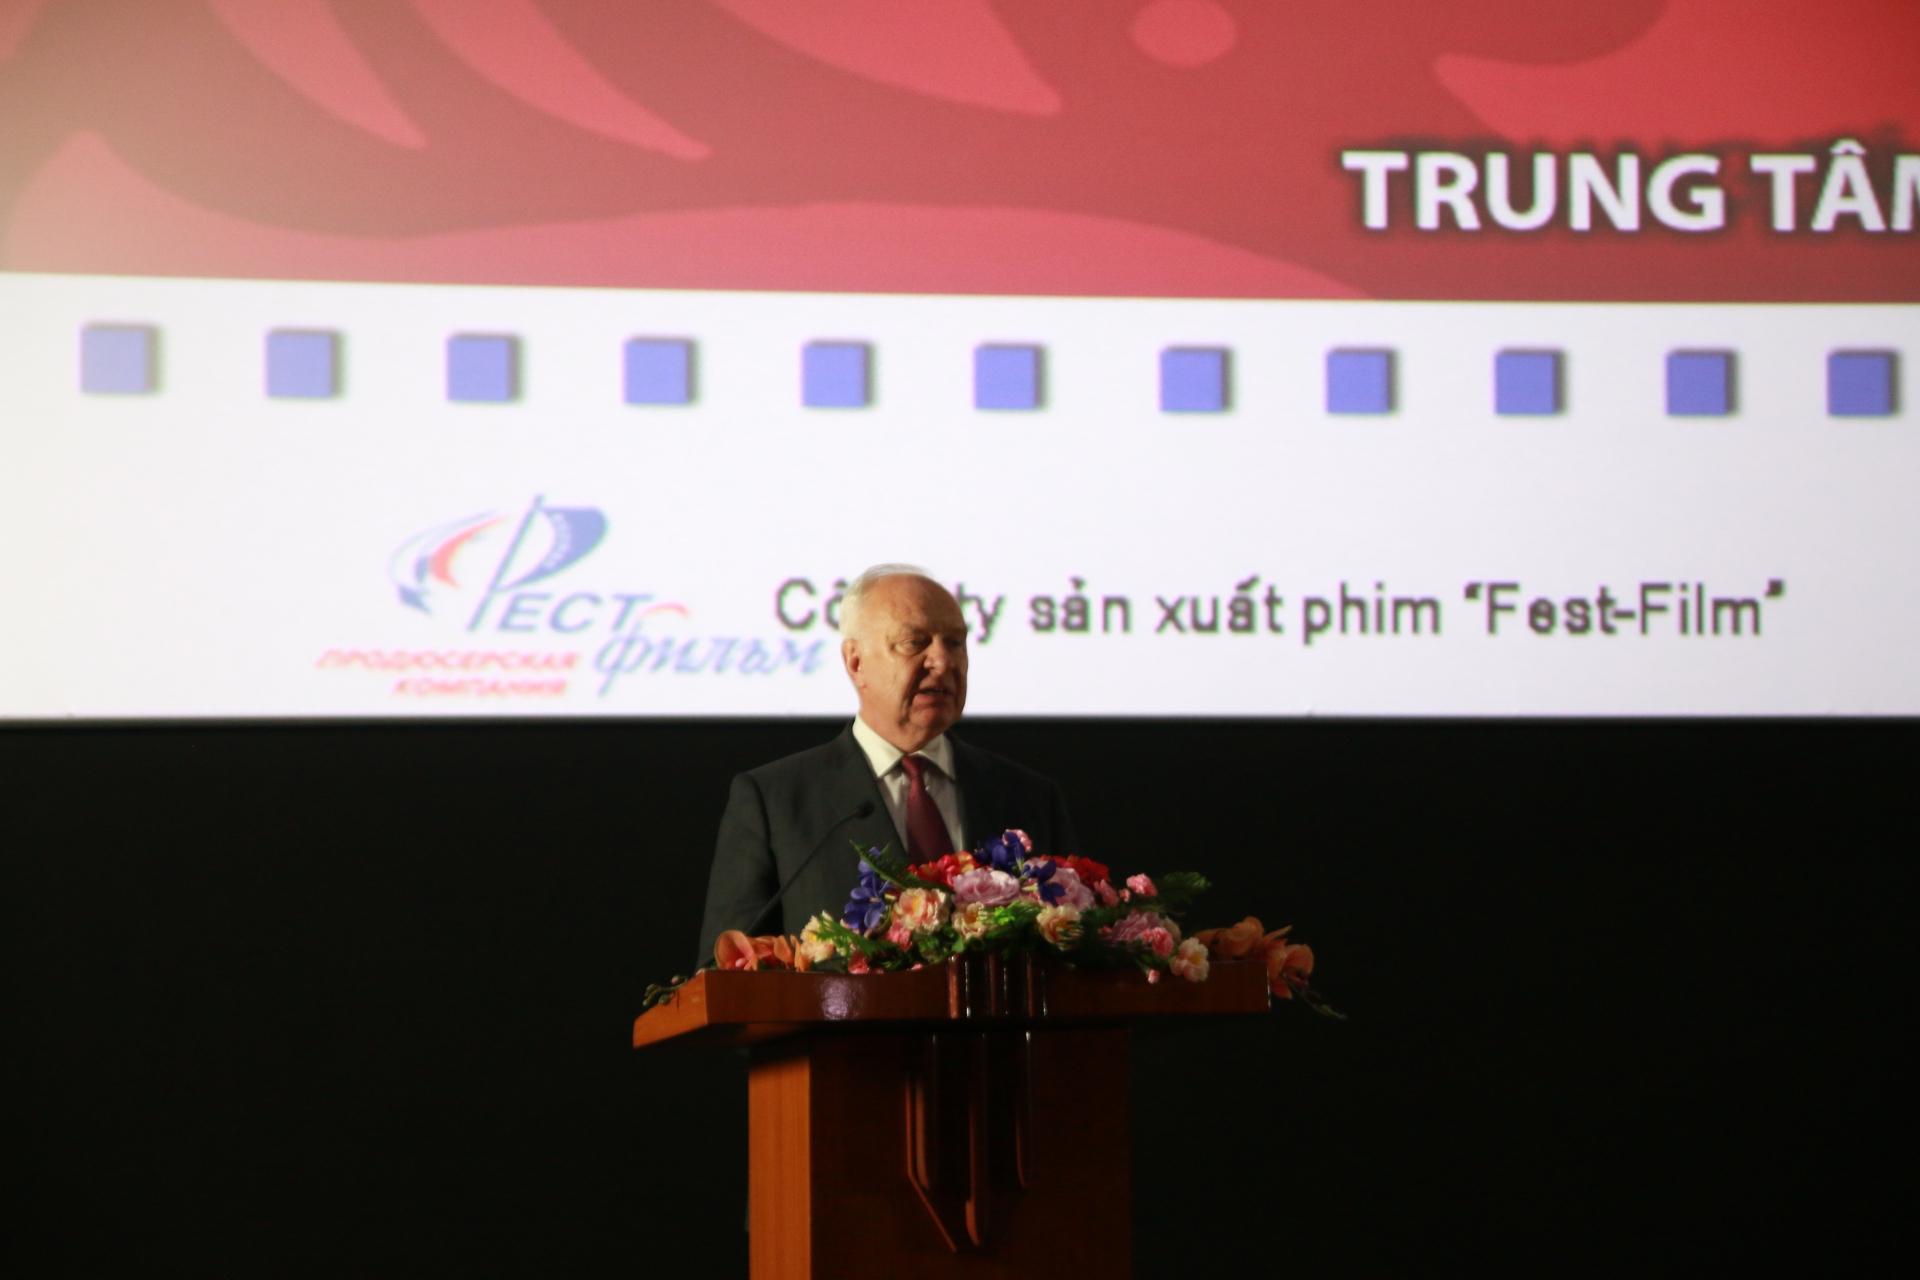 7 bo phim dac sac nhat cua nga duoc trinh chieu tai viet nam